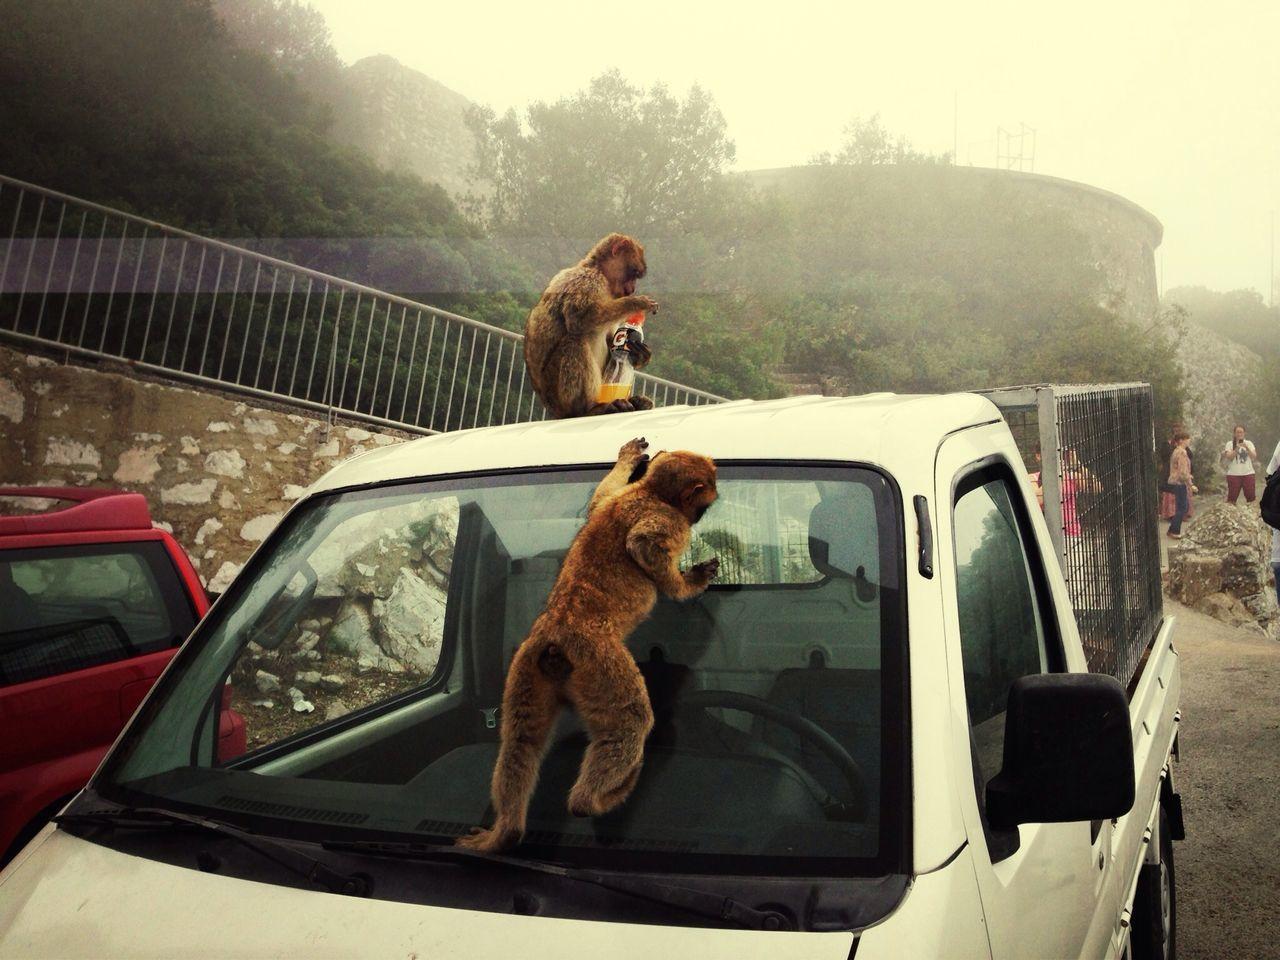 Monkeys Climbing On Pick-Up Truck